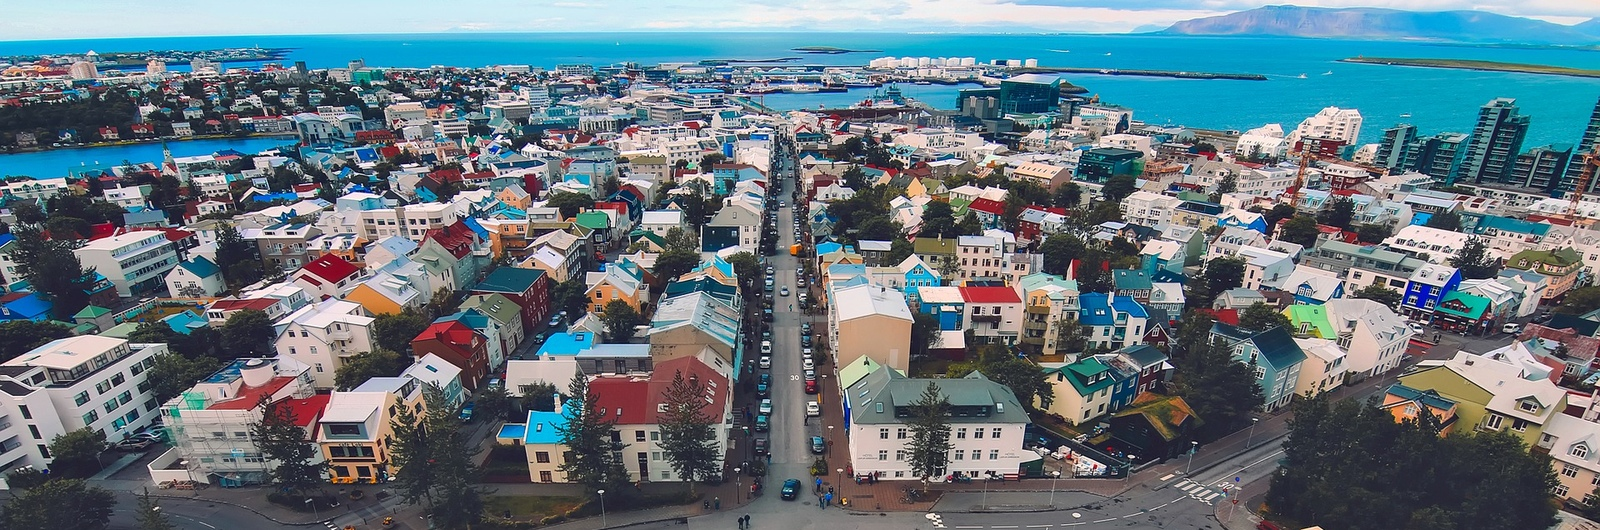 reykjavik city header